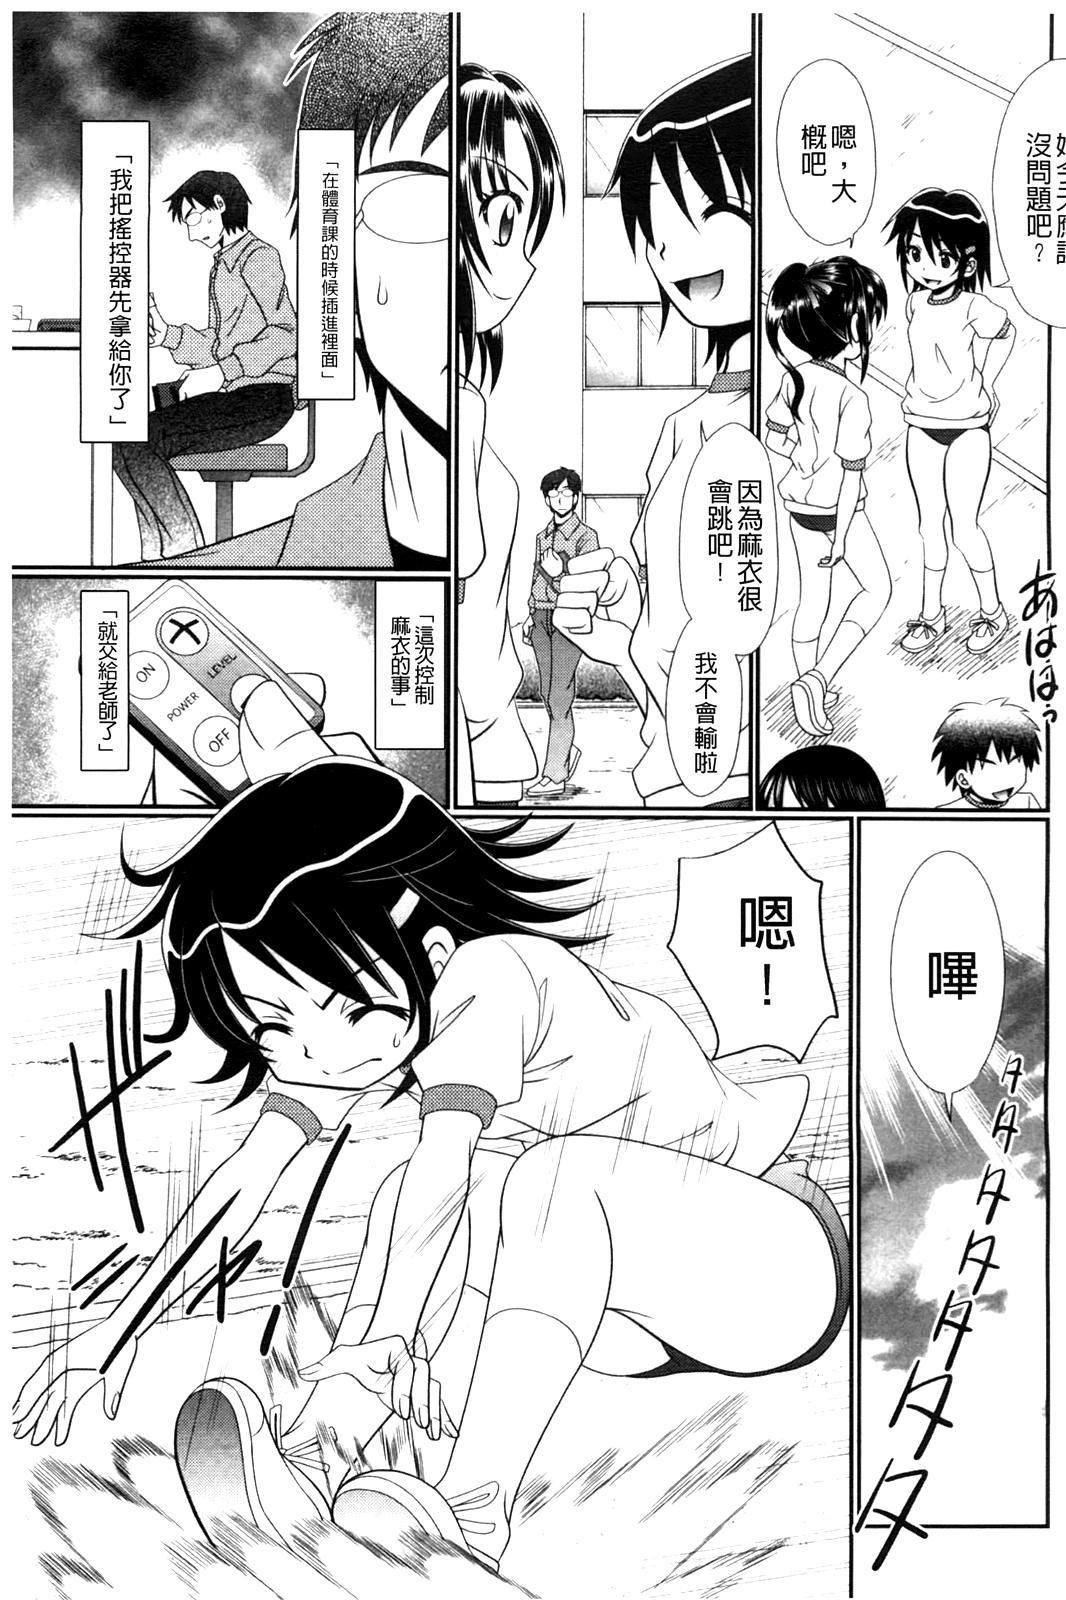 Higyaku Kyoushitsu 109